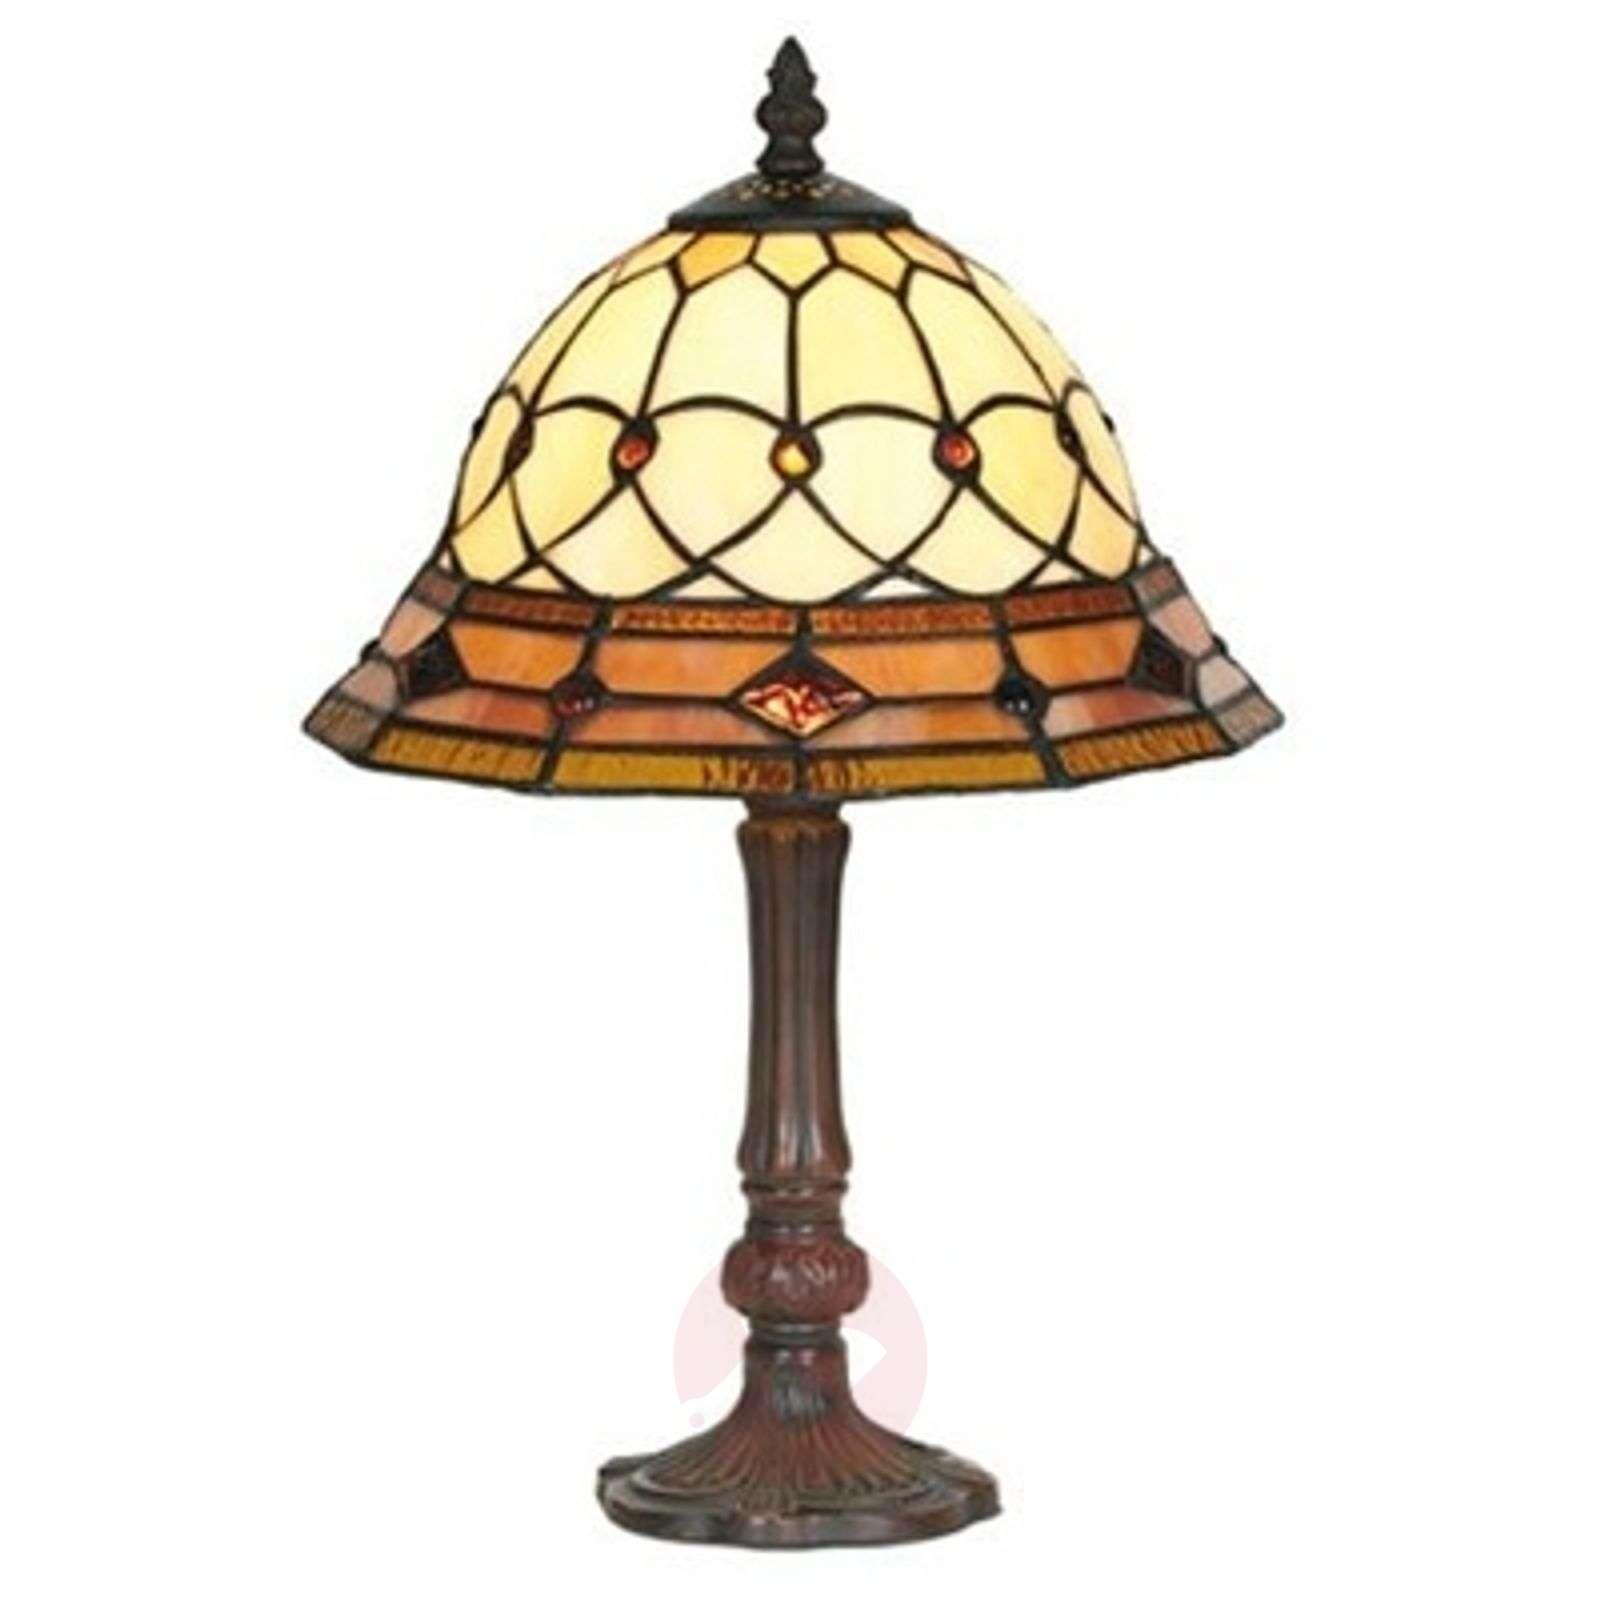 Handmade table lamp KASSANDRA, 42 cm-1032118-01